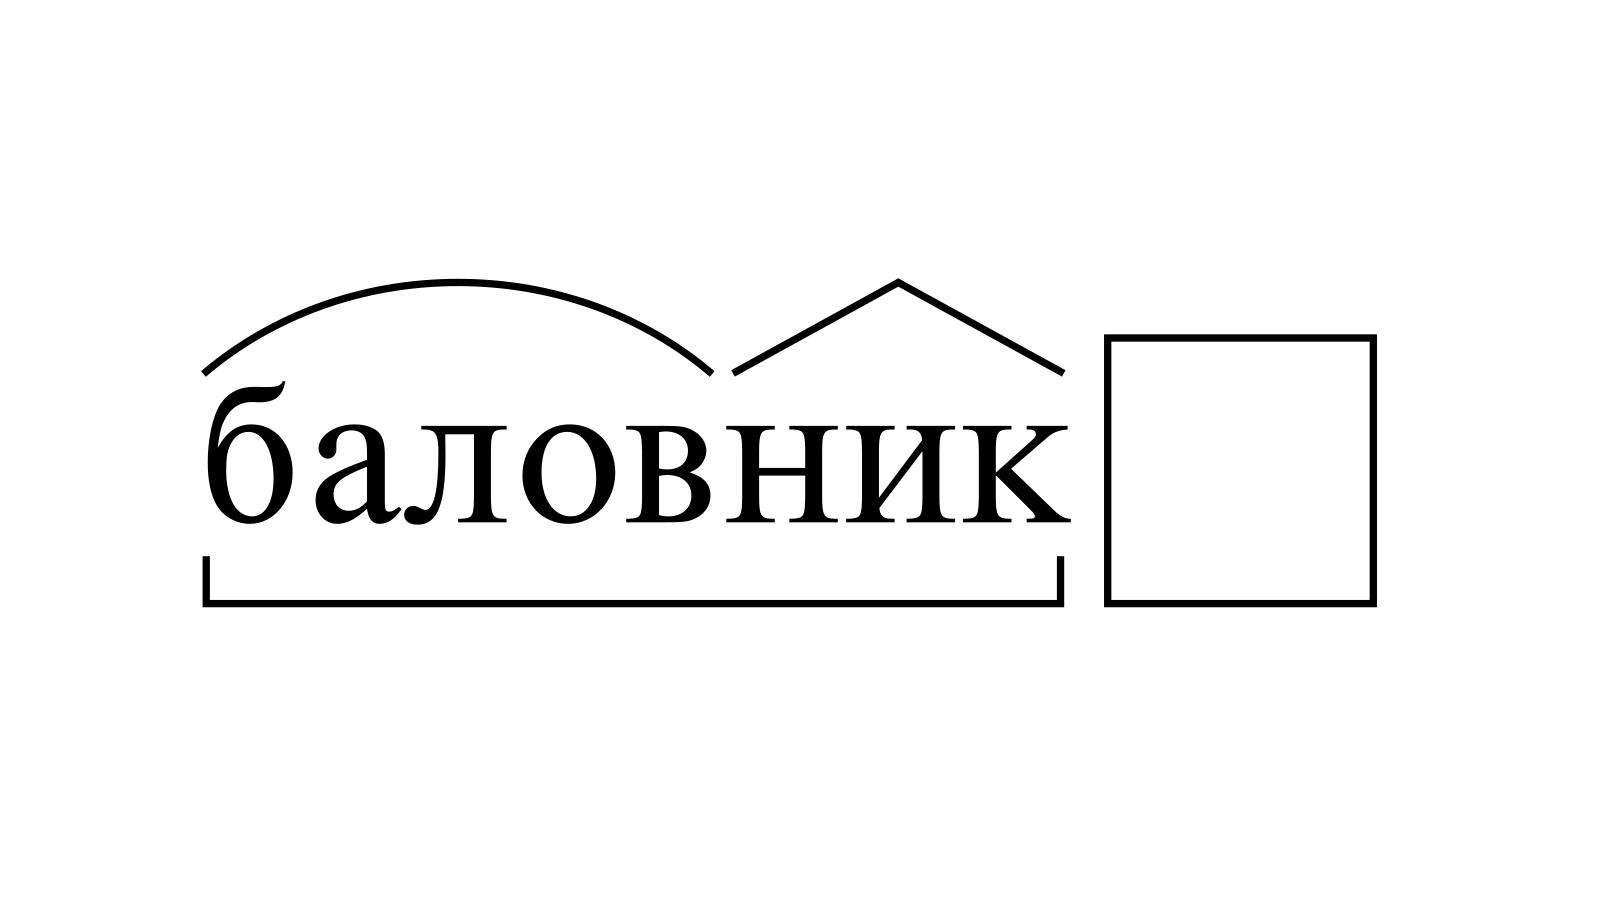 Разбор слова «баловник» по составу